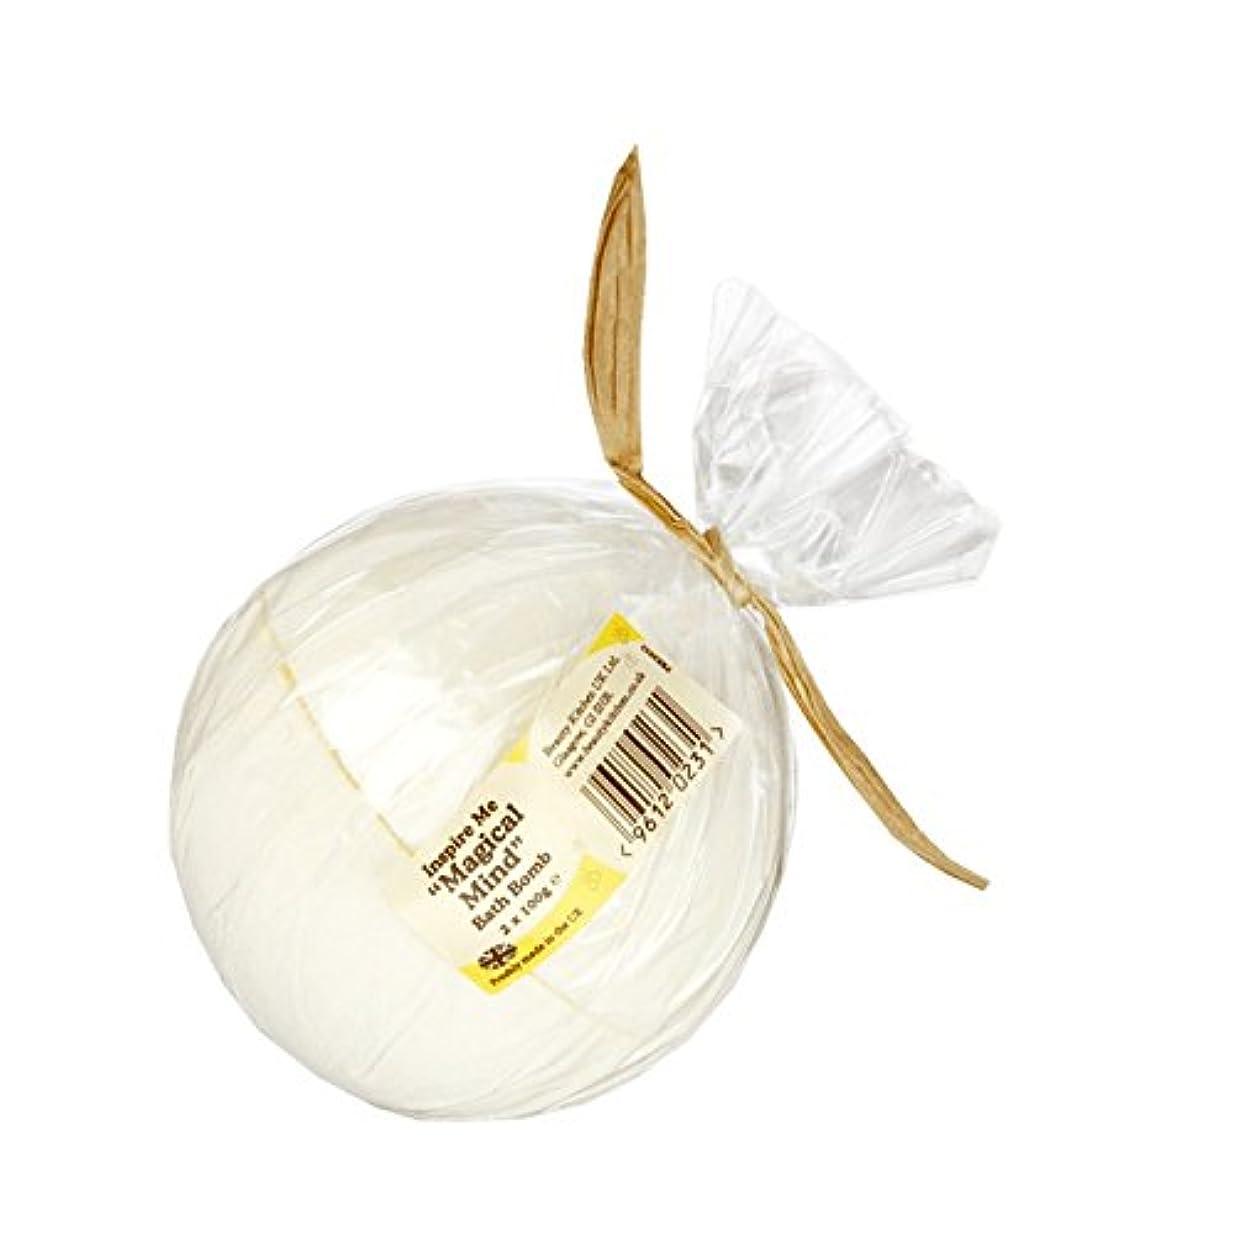 Beauty Kitchen Inspire Me Magical Mind Bath Bomb 2 x 100g (Pack of 6) - 美しさのキッチンは私に魔法心風呂爆弾2×100グラムを鼓舞します (x6)...